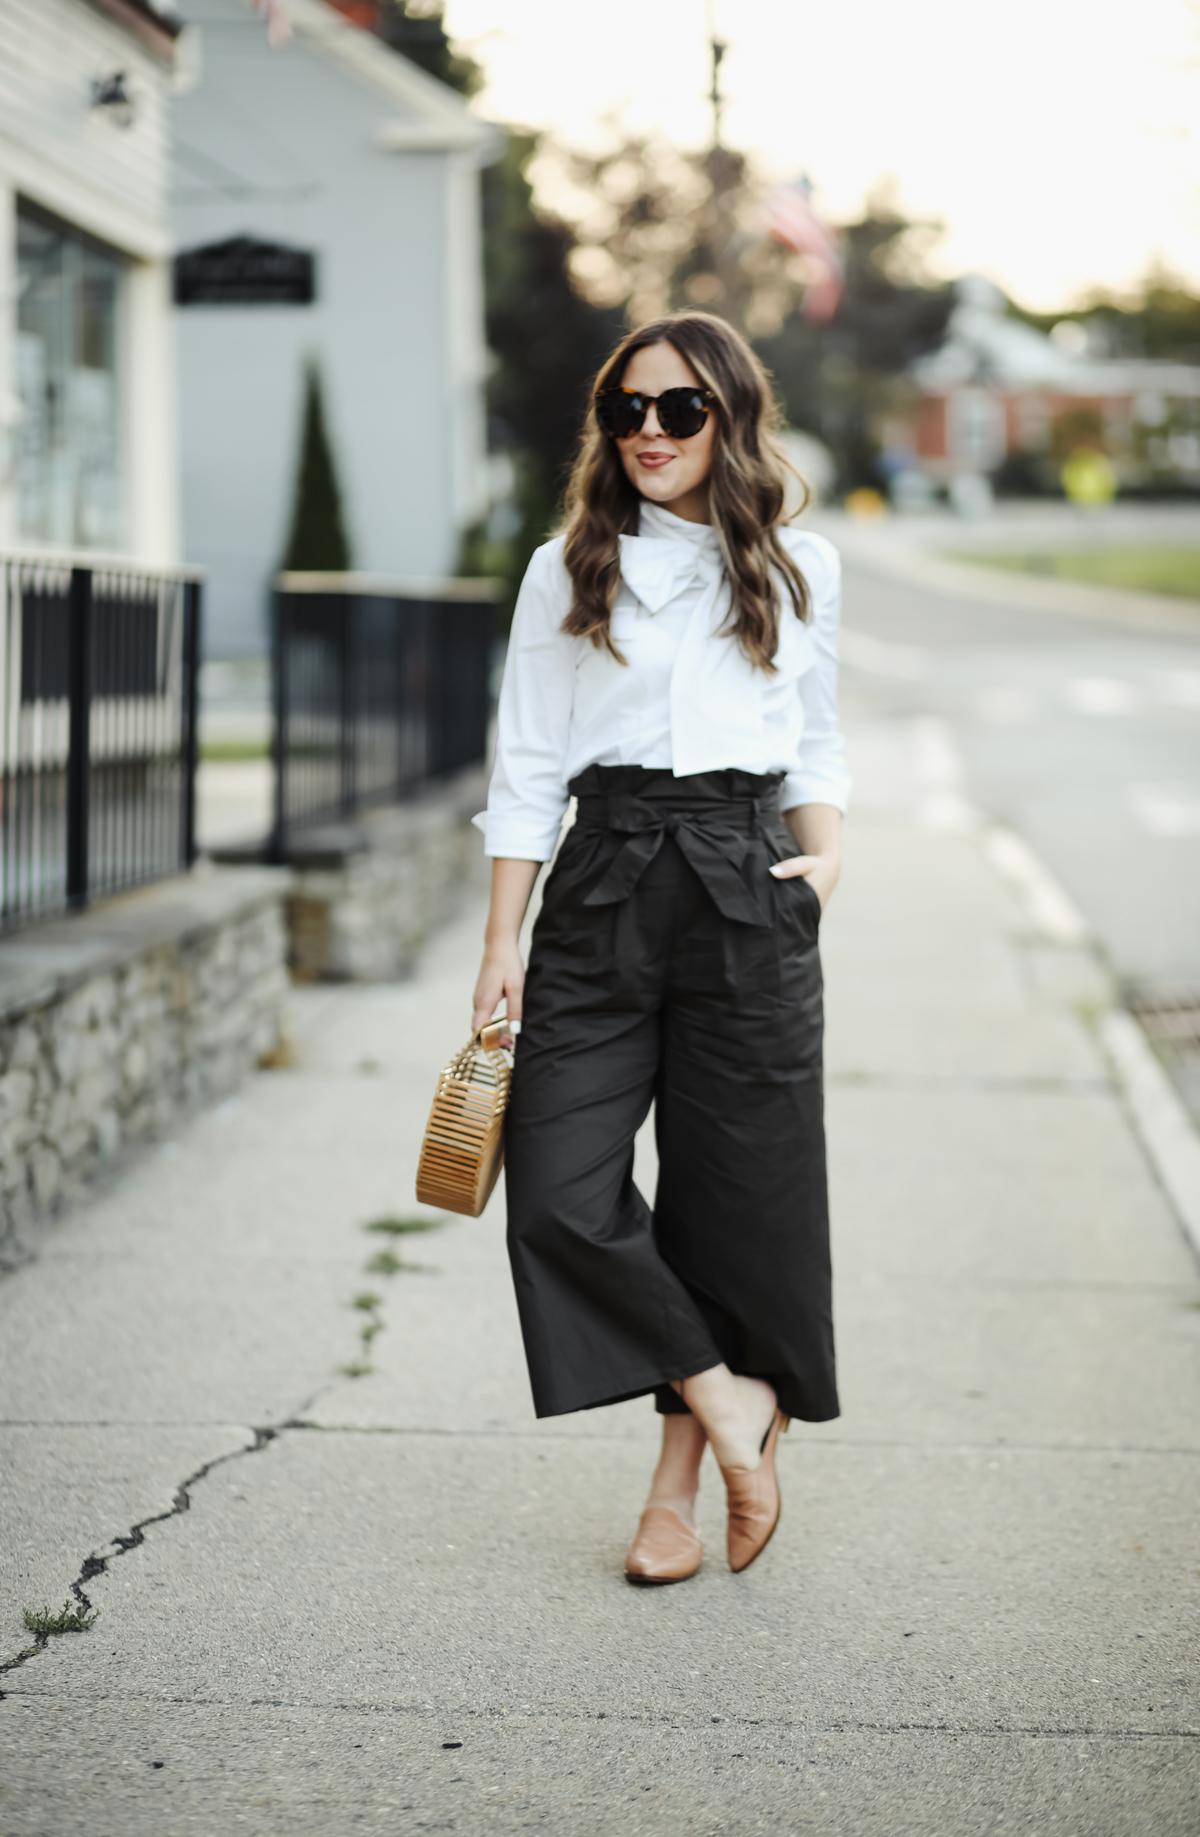 trend to try: the paperbag waist. - dress cori lynn